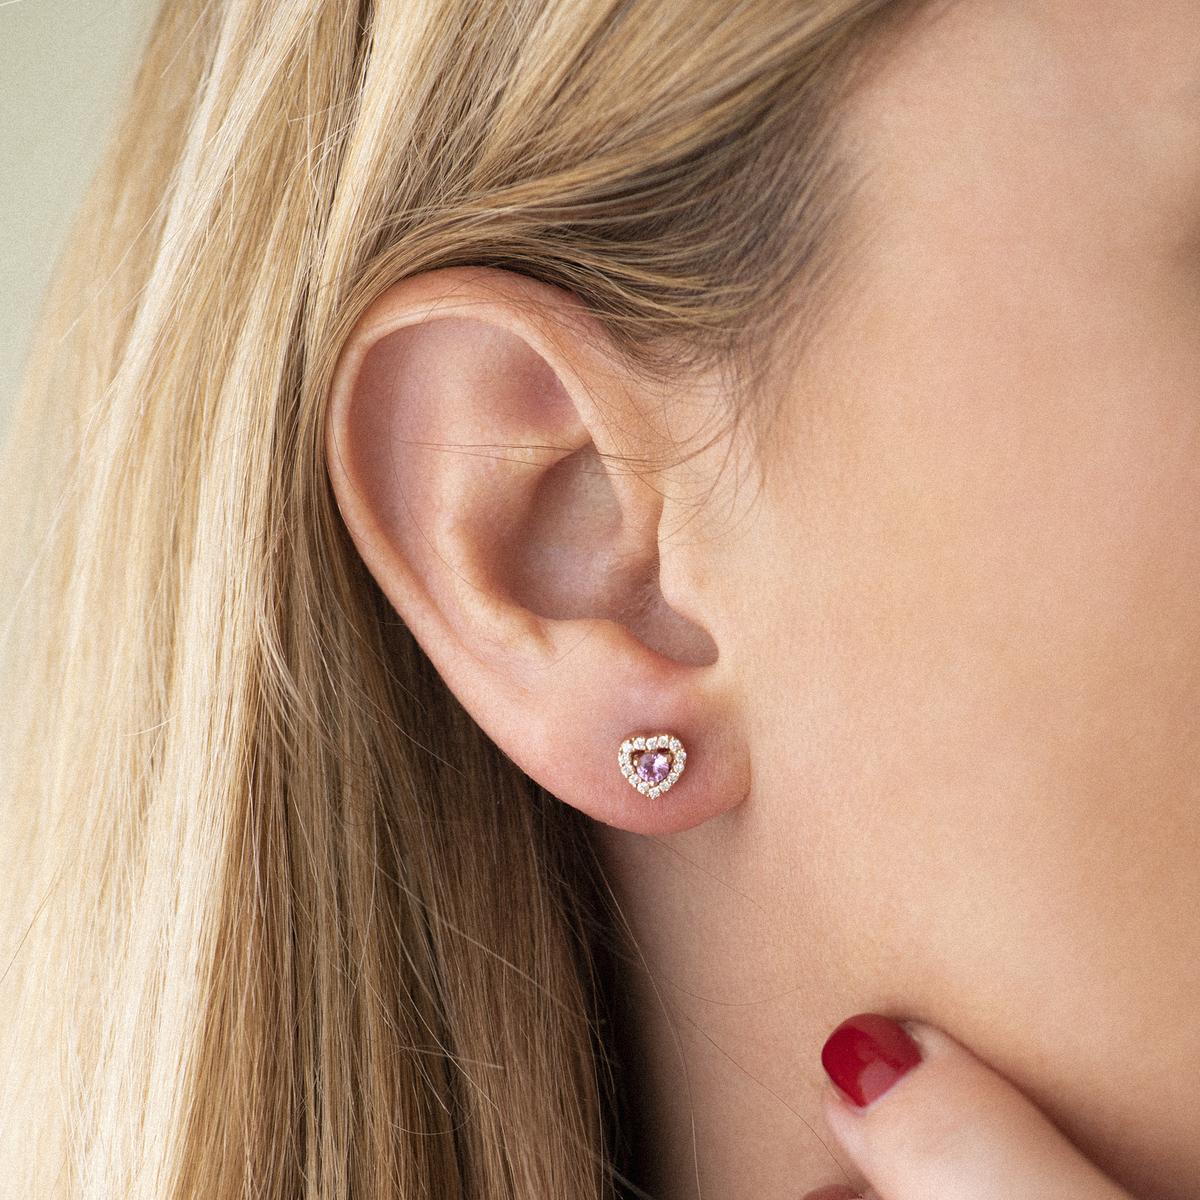 salina earrings in rose gold